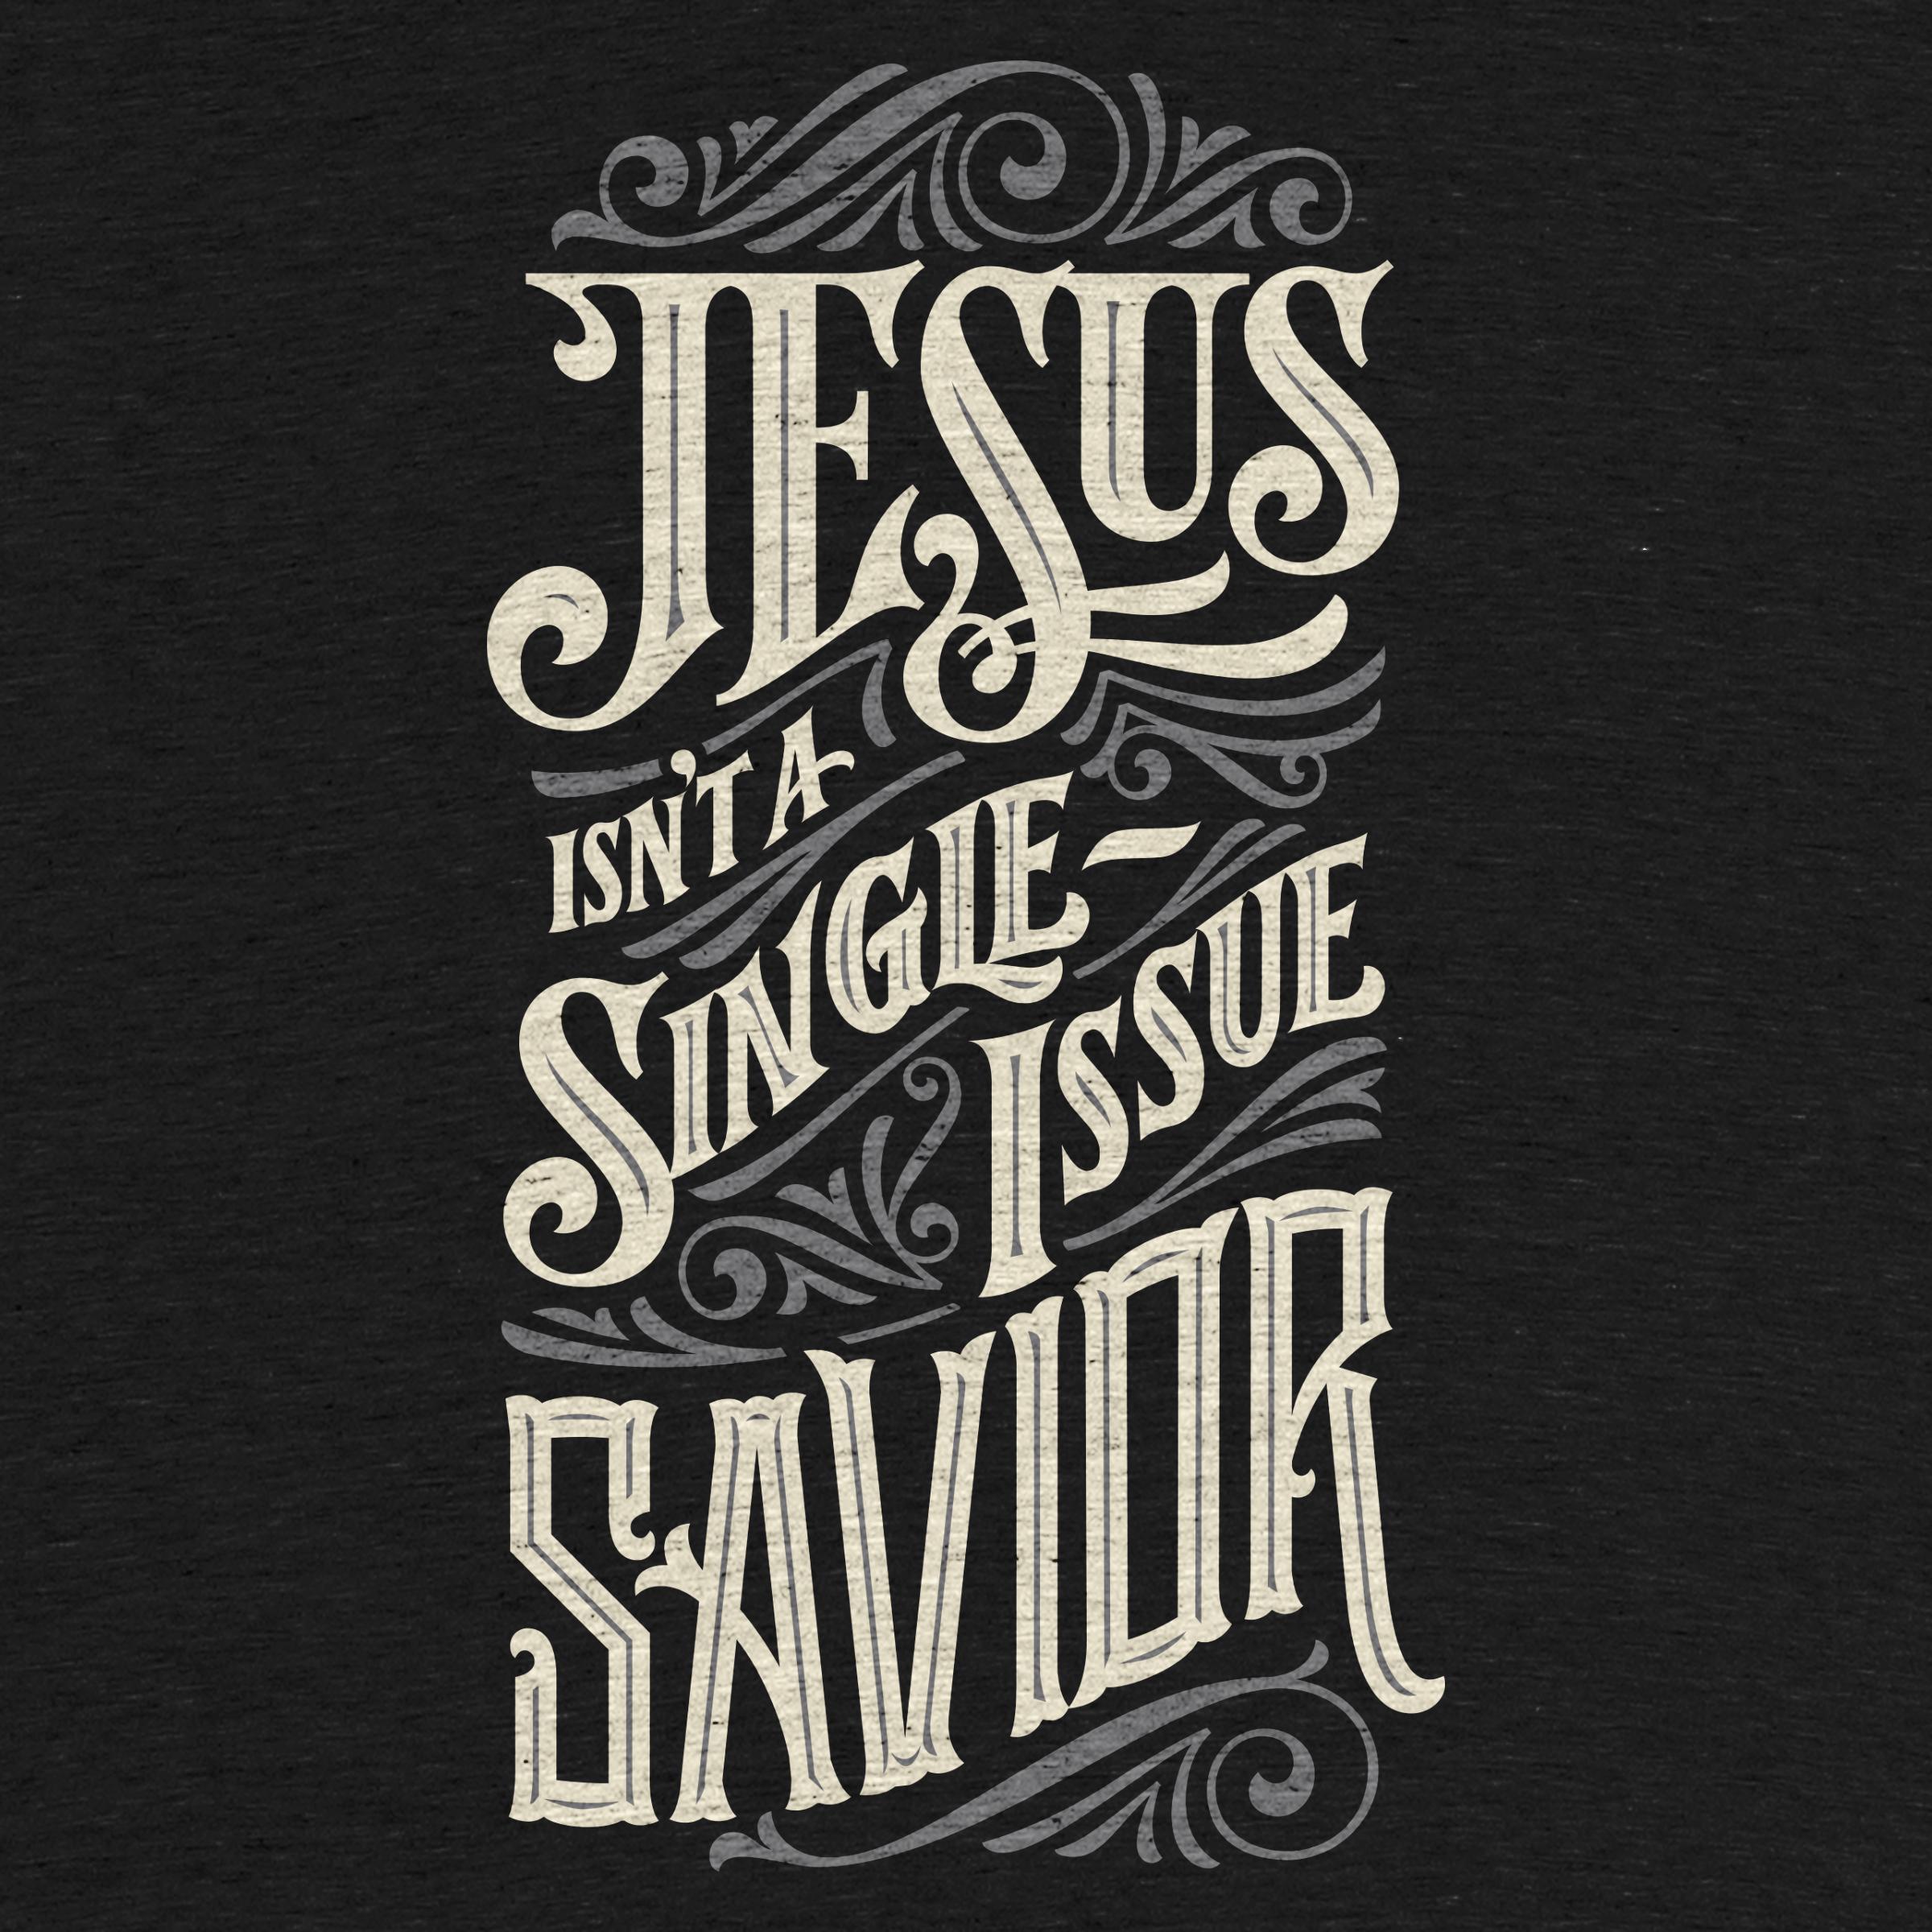 Single-Issue Savior